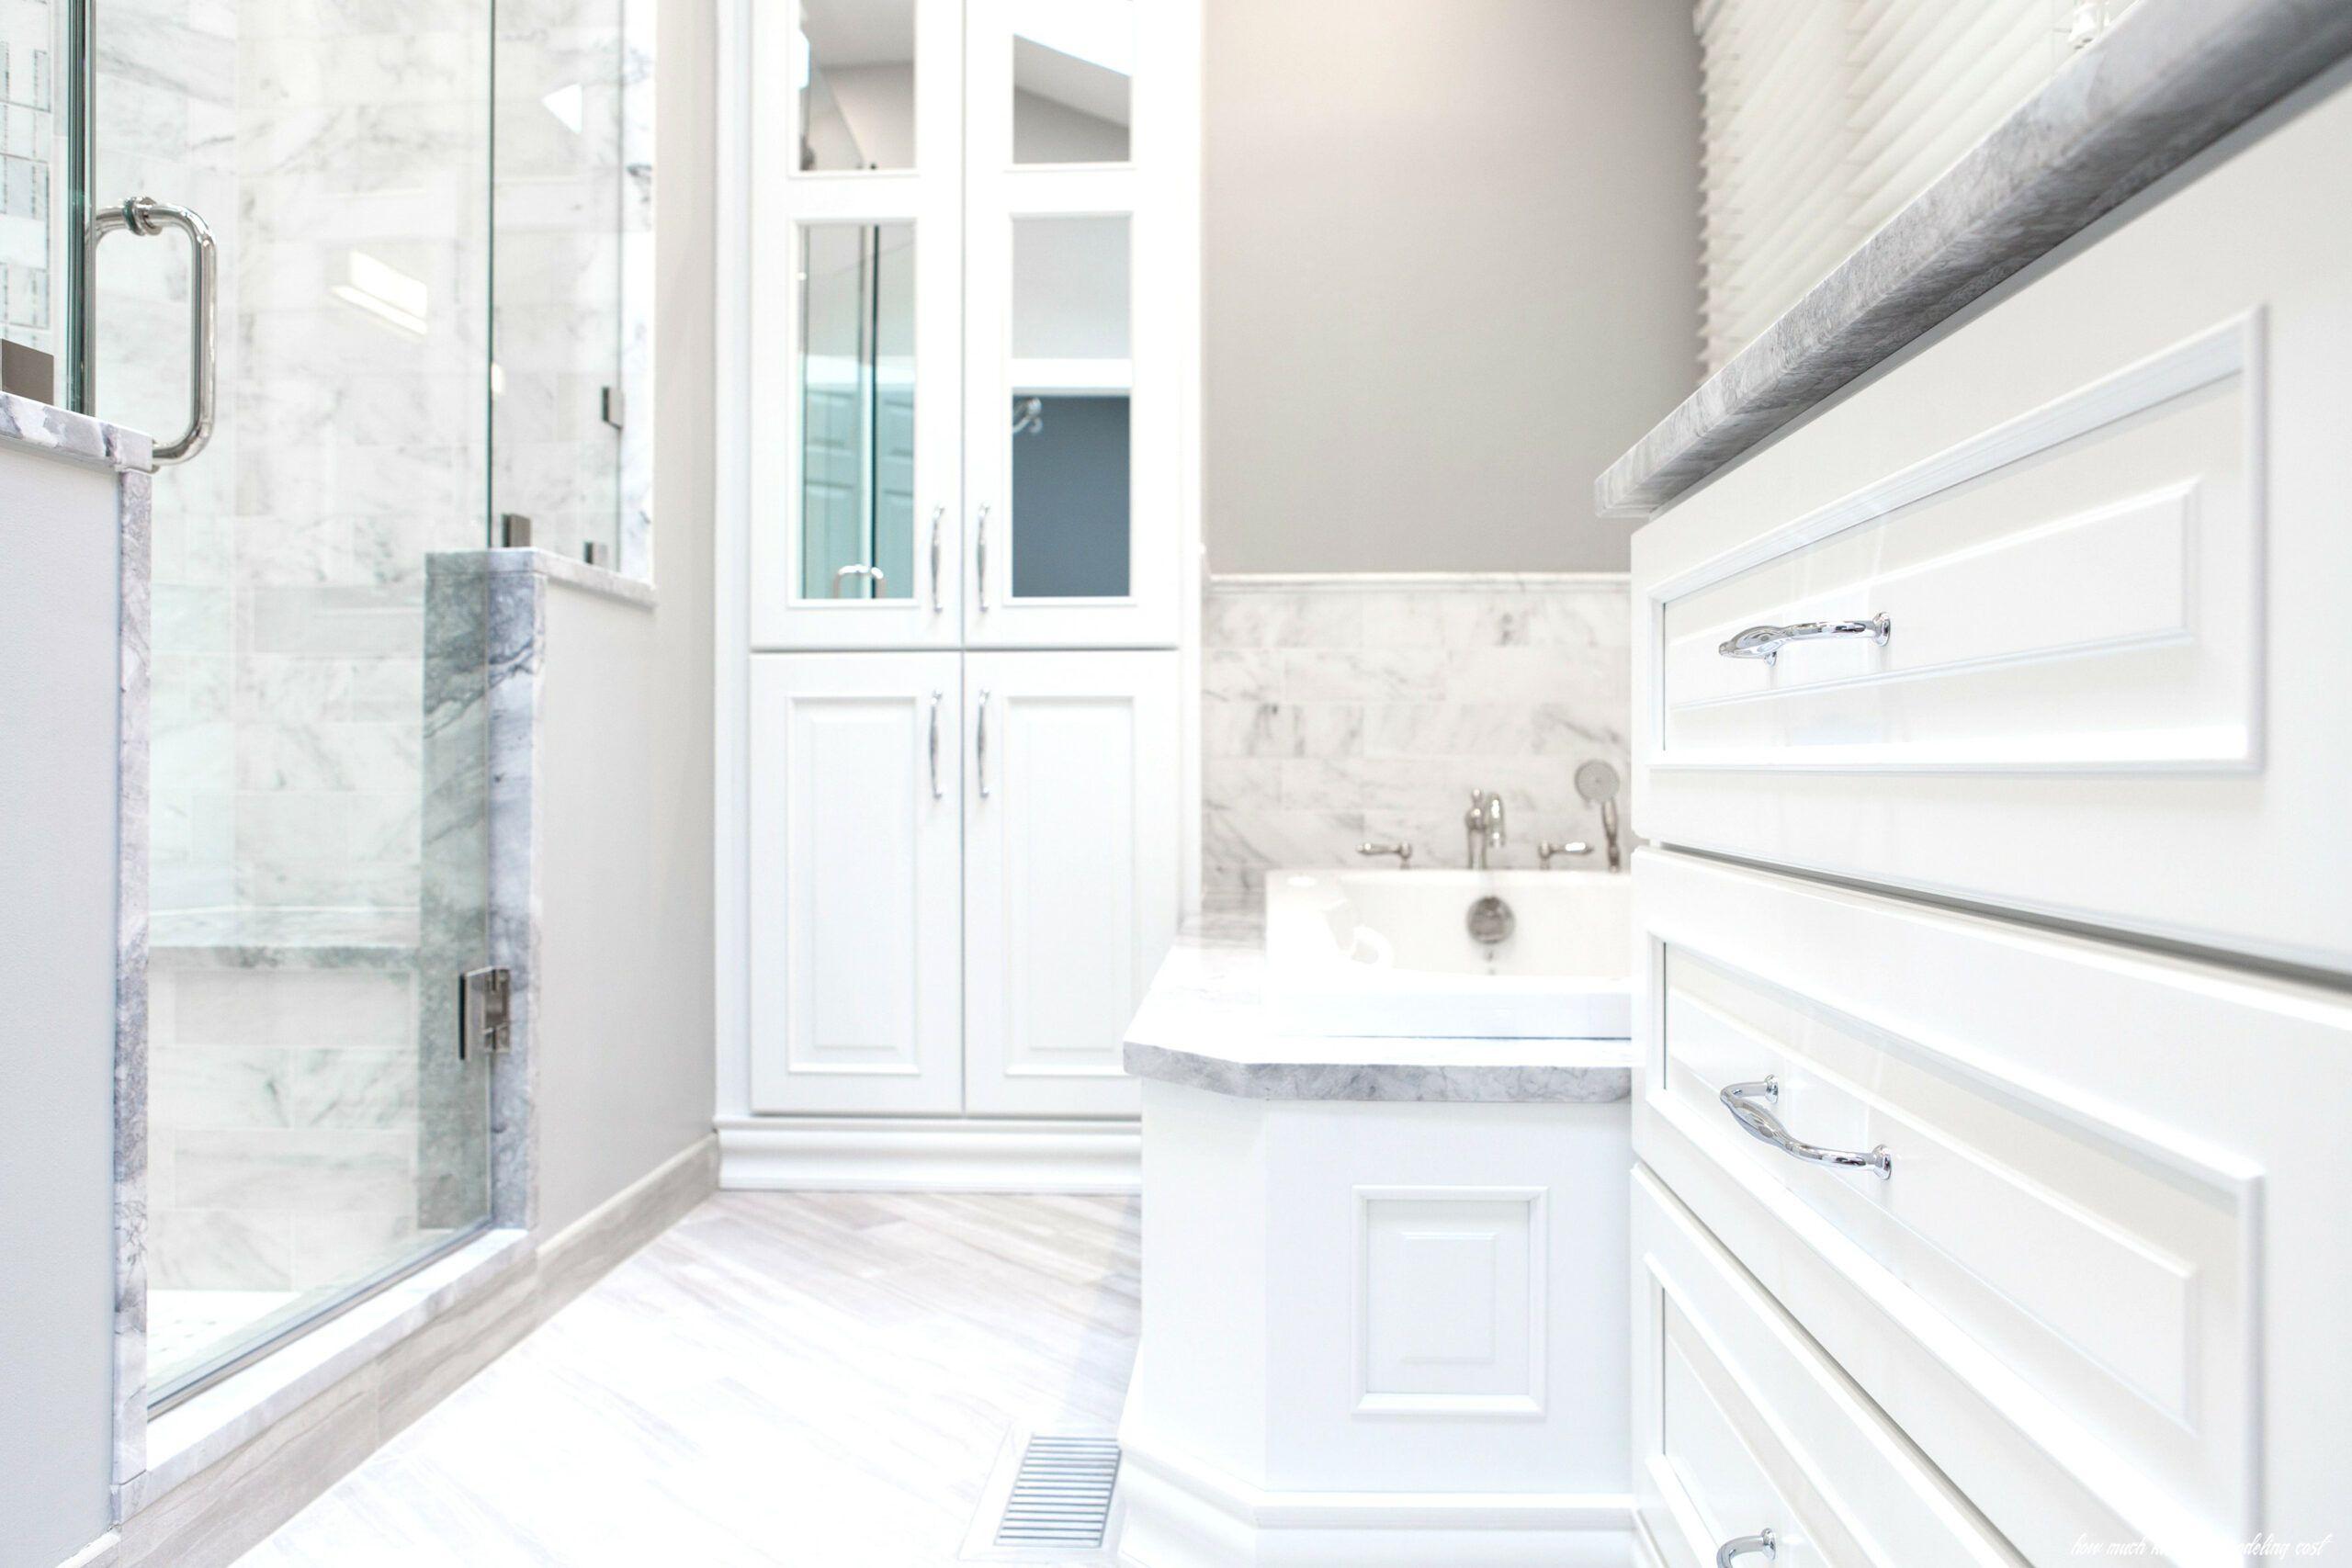 2020 Bathroom Remodel Cost Average Cost Of Bathroom Remodel Renovations Small Bathroom Remodel Cost Average Bathroom Remodel Cost Bathroom Remodel Cost